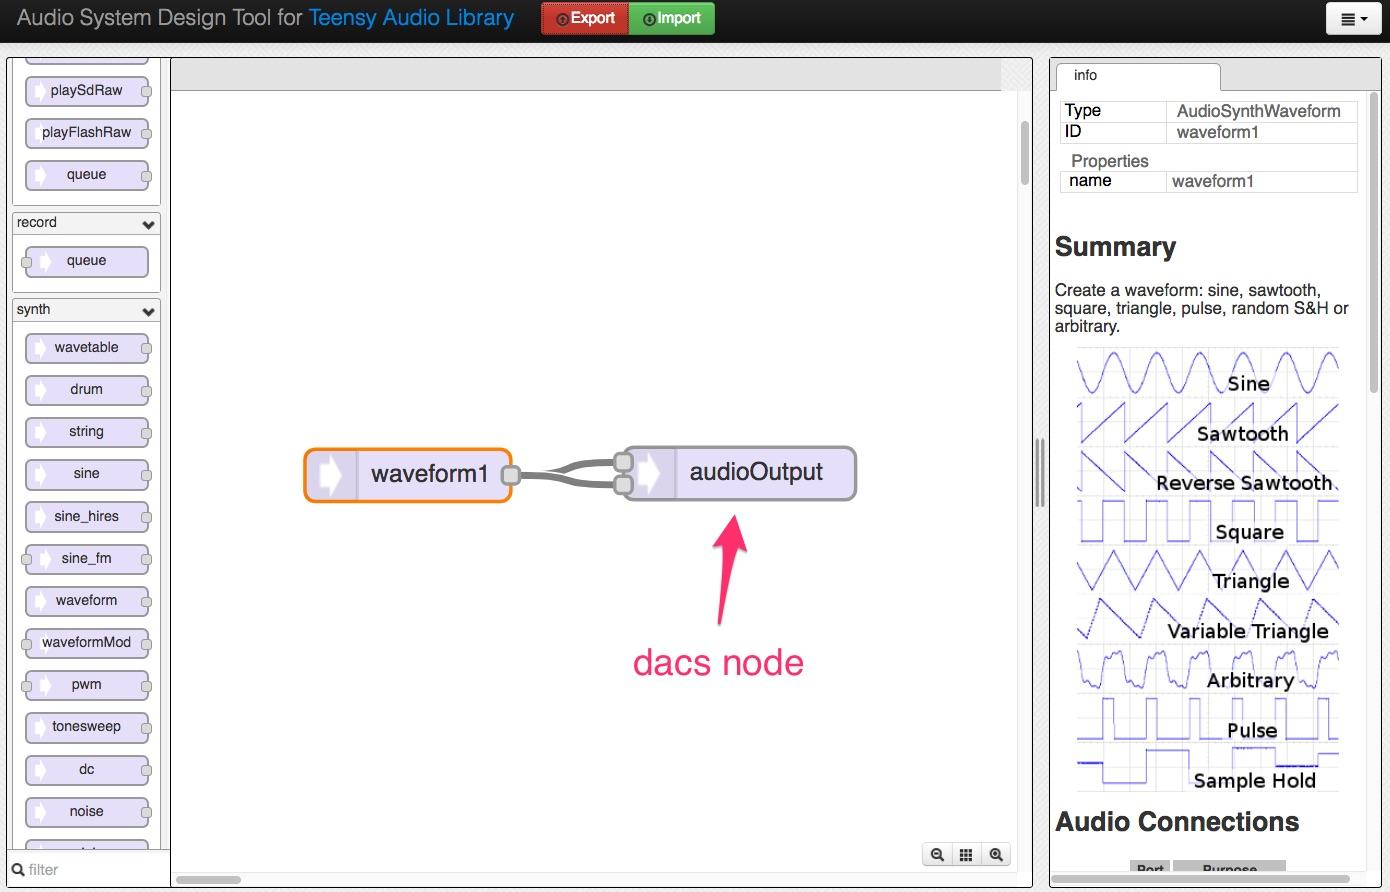 adabox_Audio_System_Design_Tool_for_Teensy_Audio_Library_15.jpg